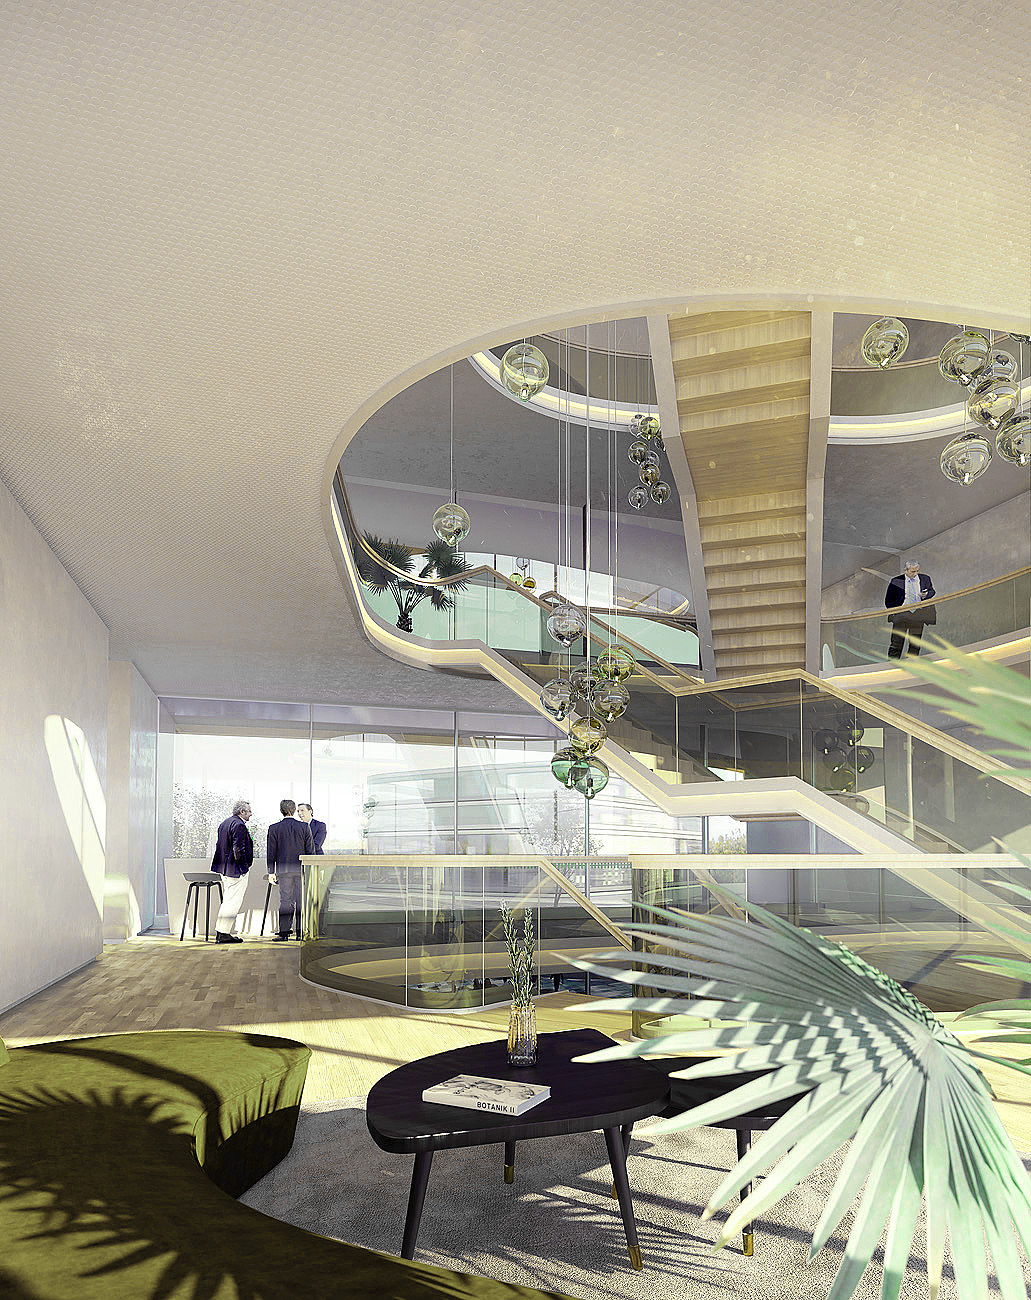 Architekturvisualisierung Innenraum